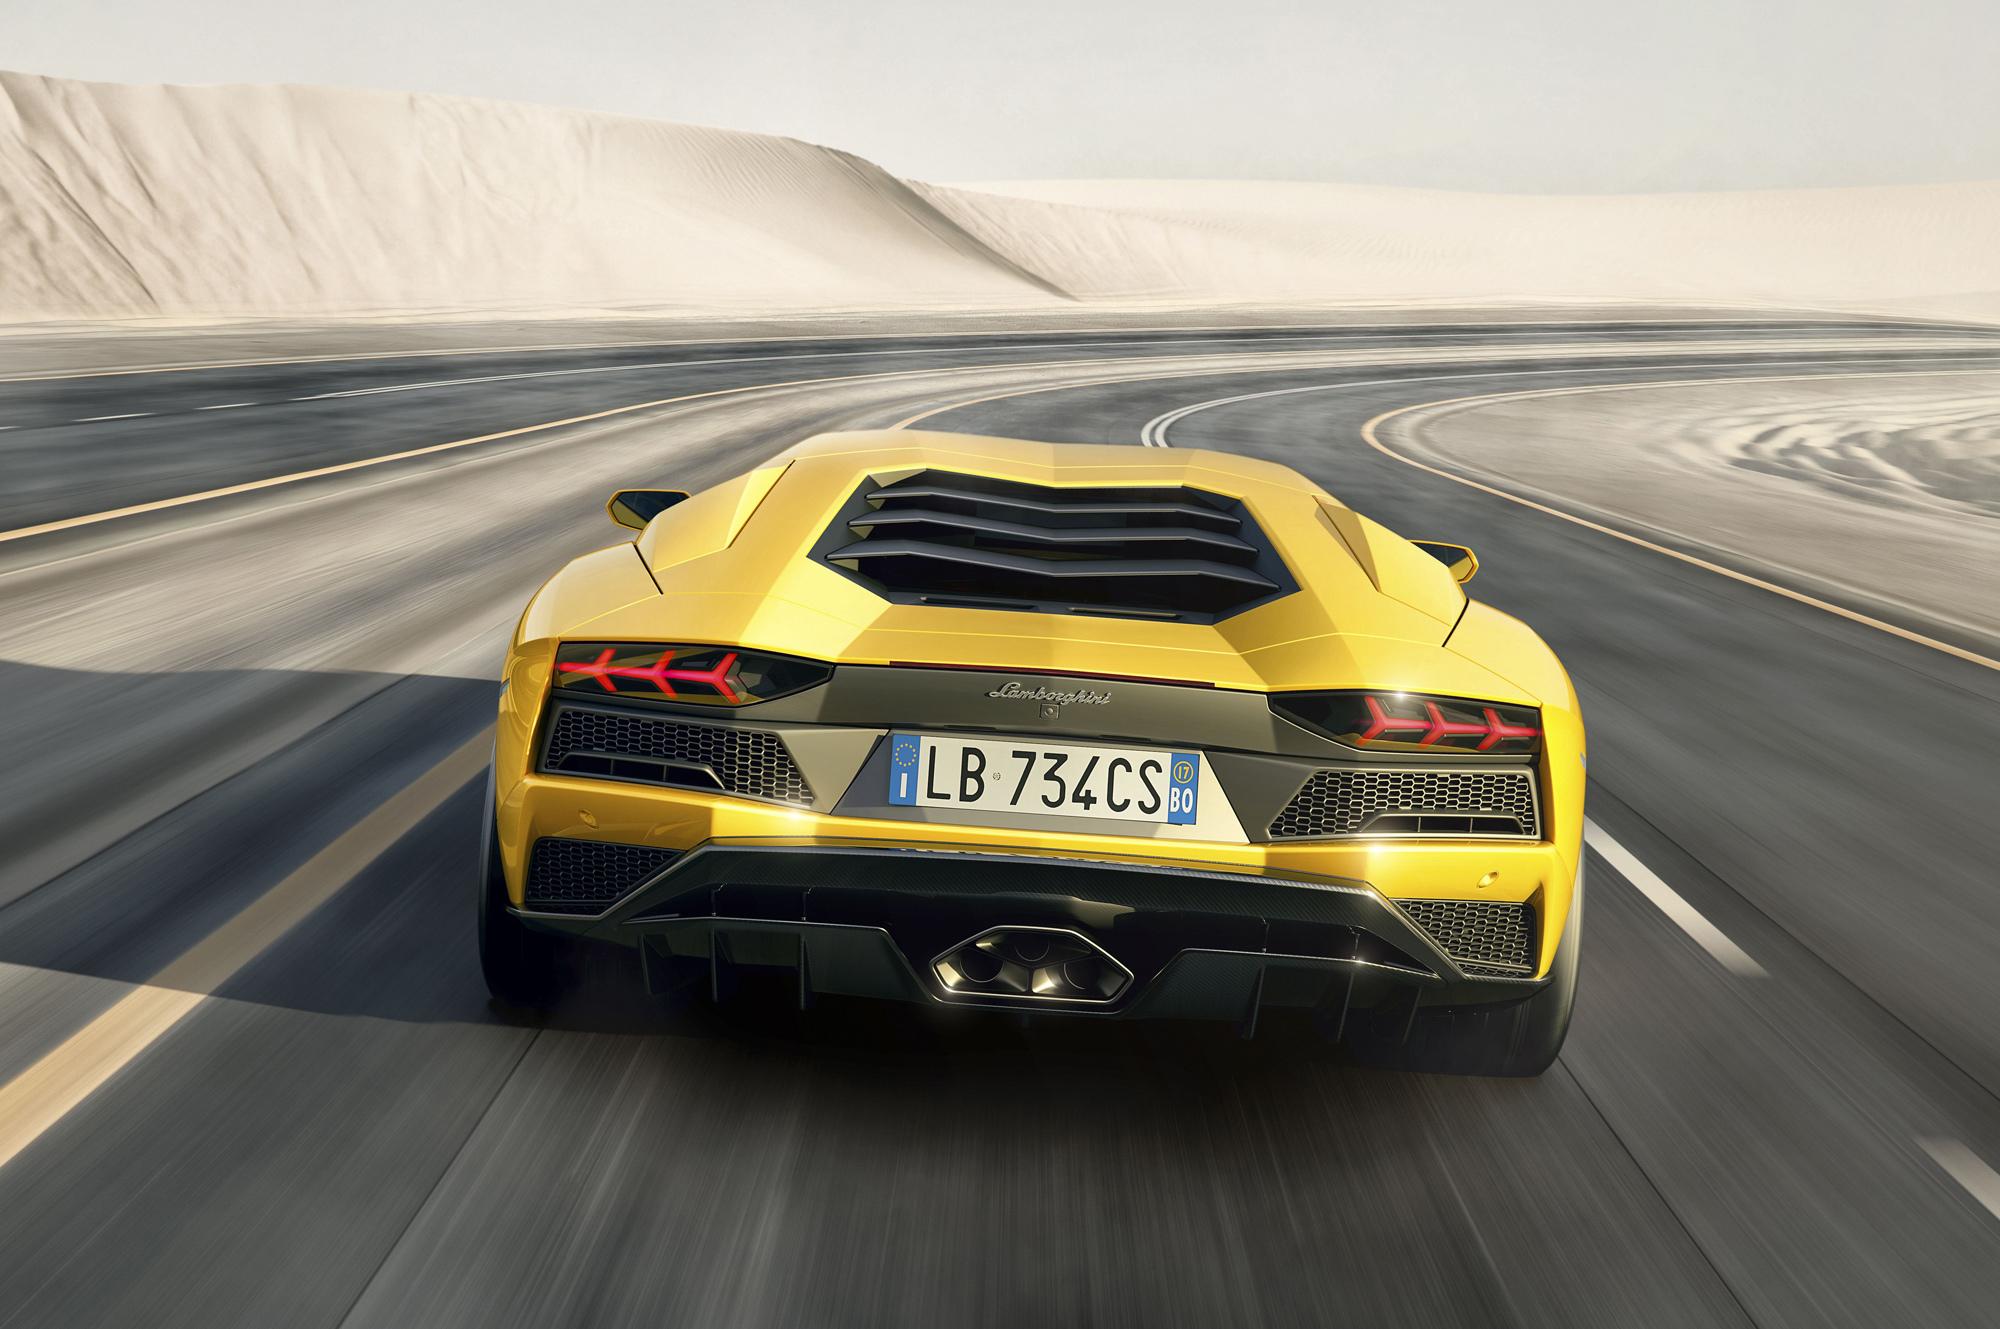 Lamborghini Aventador S High Quality Wallpapers